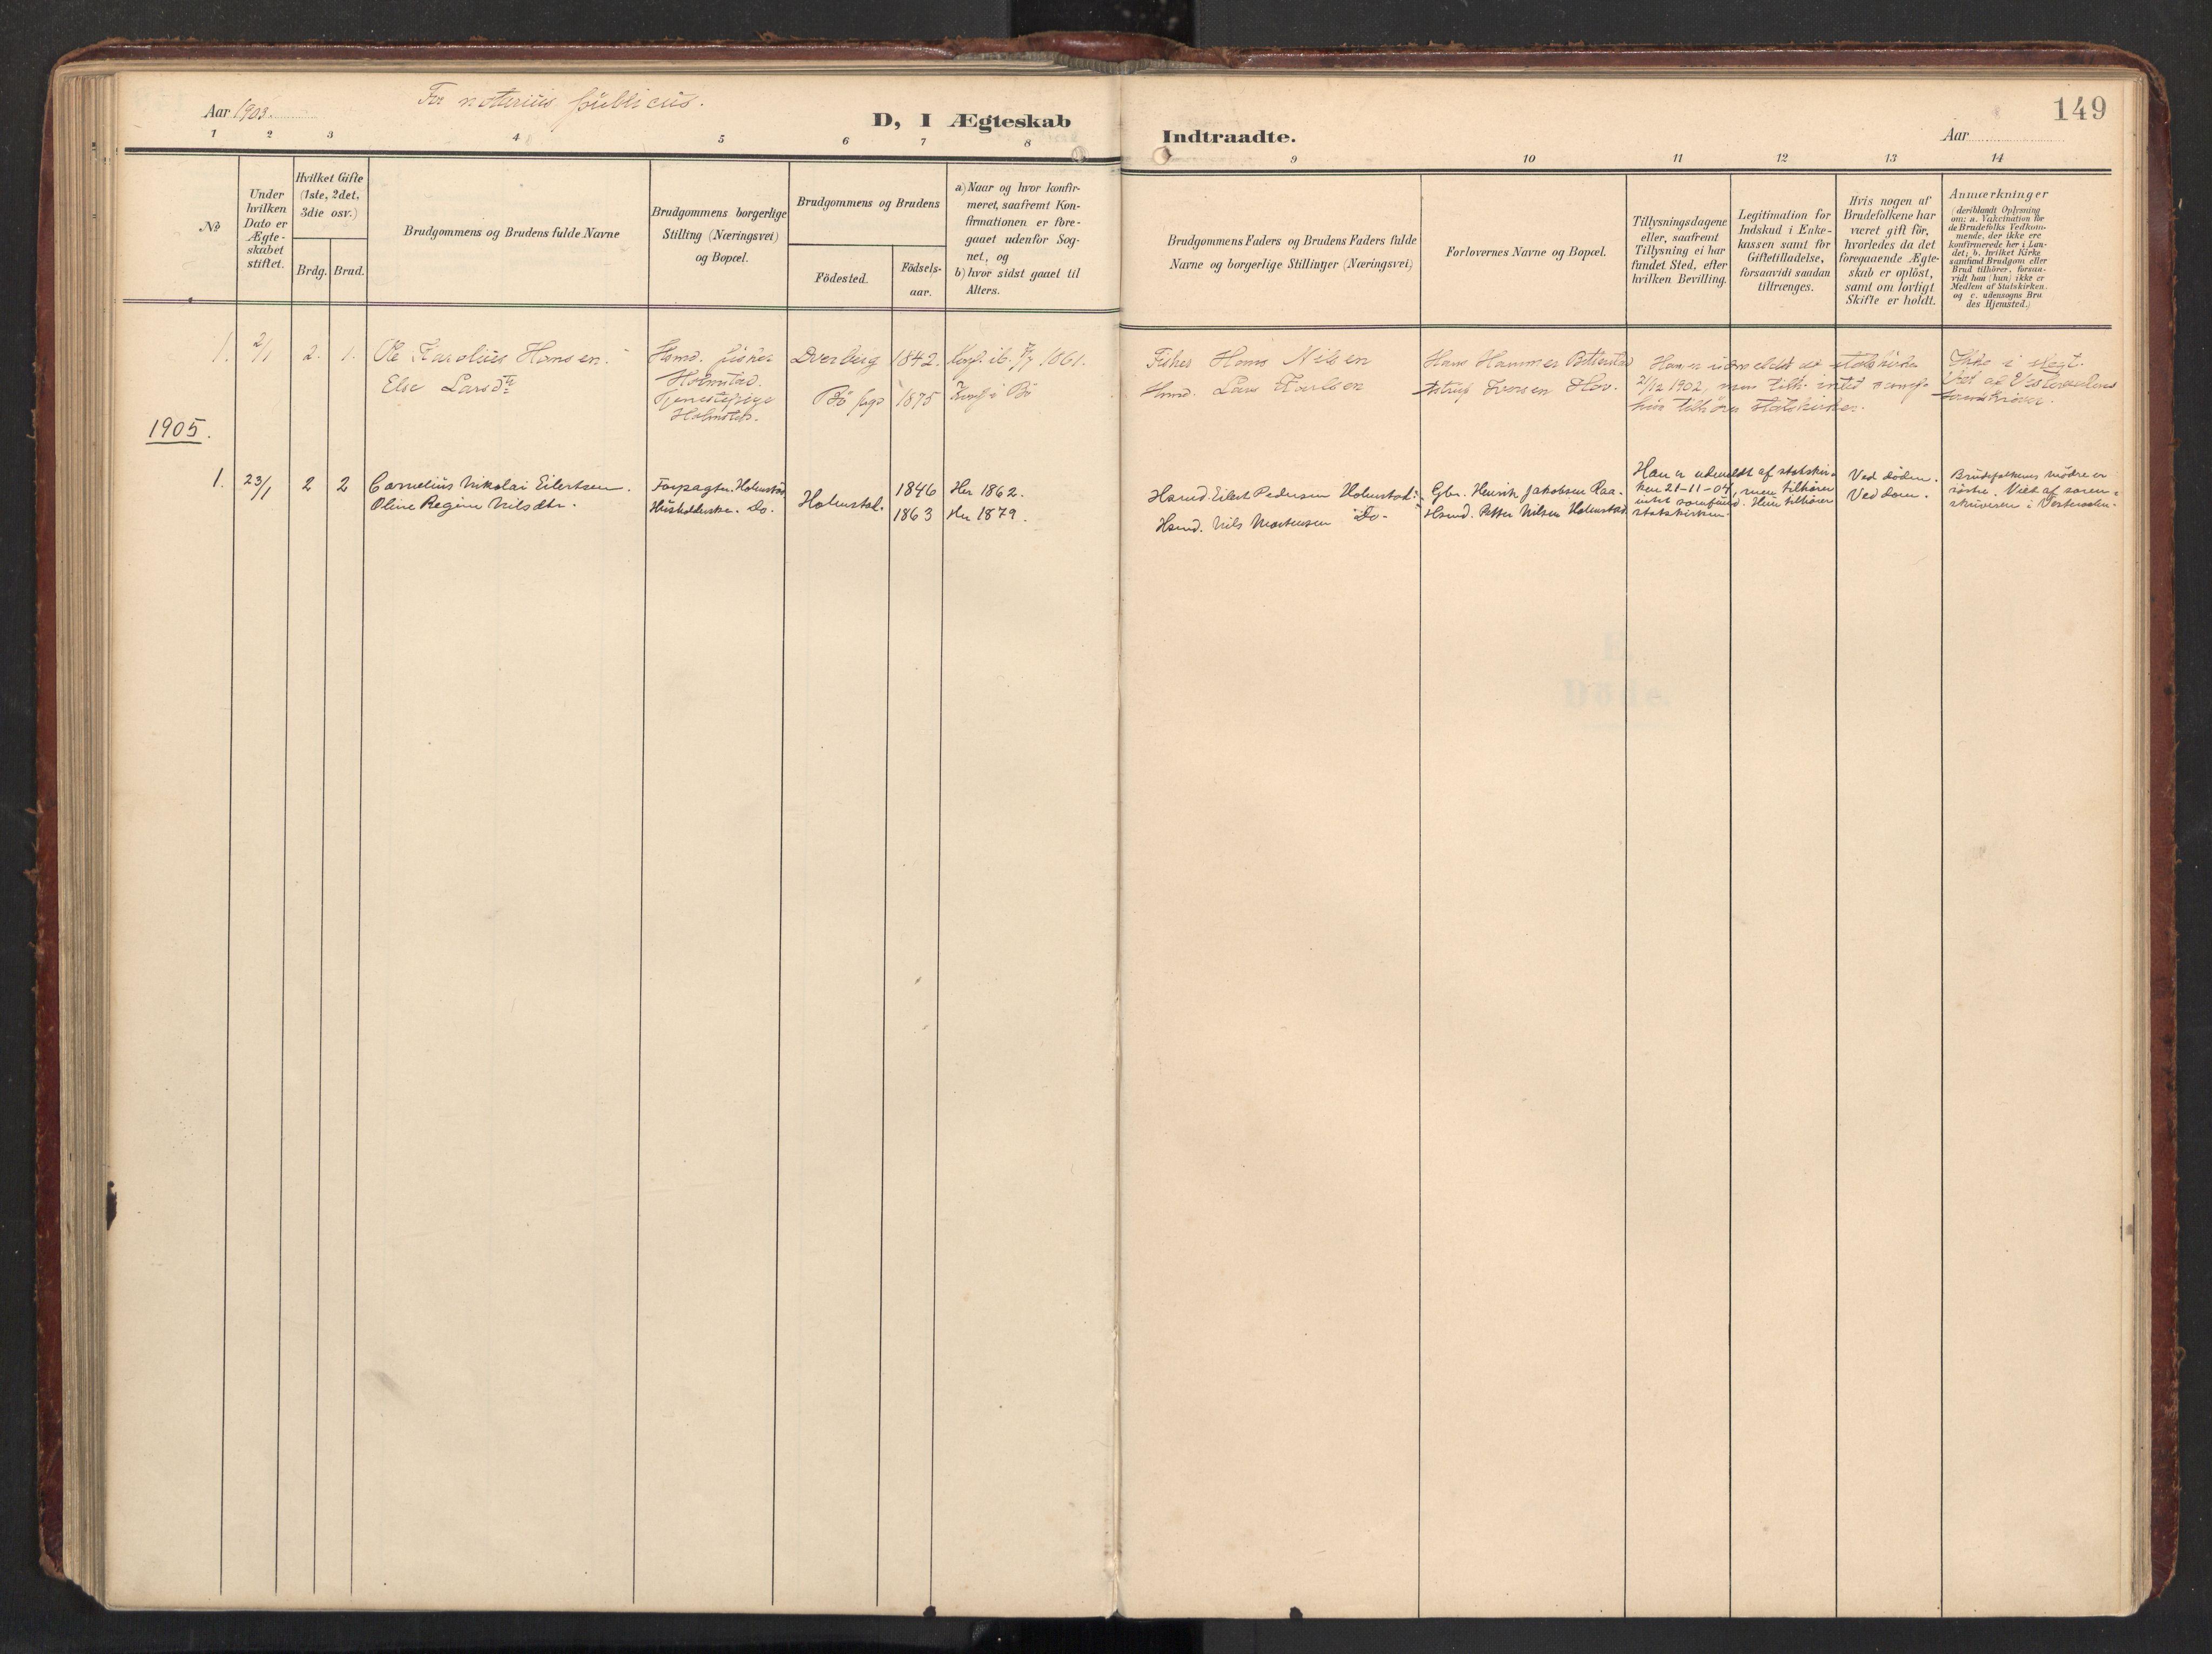 SAT, Ministerialprotokoller, klokkerbøker og fødselsregistre - Nordland, 890/L1287: Ministerialbok nr. 890A02, 1903-1915, s. 149